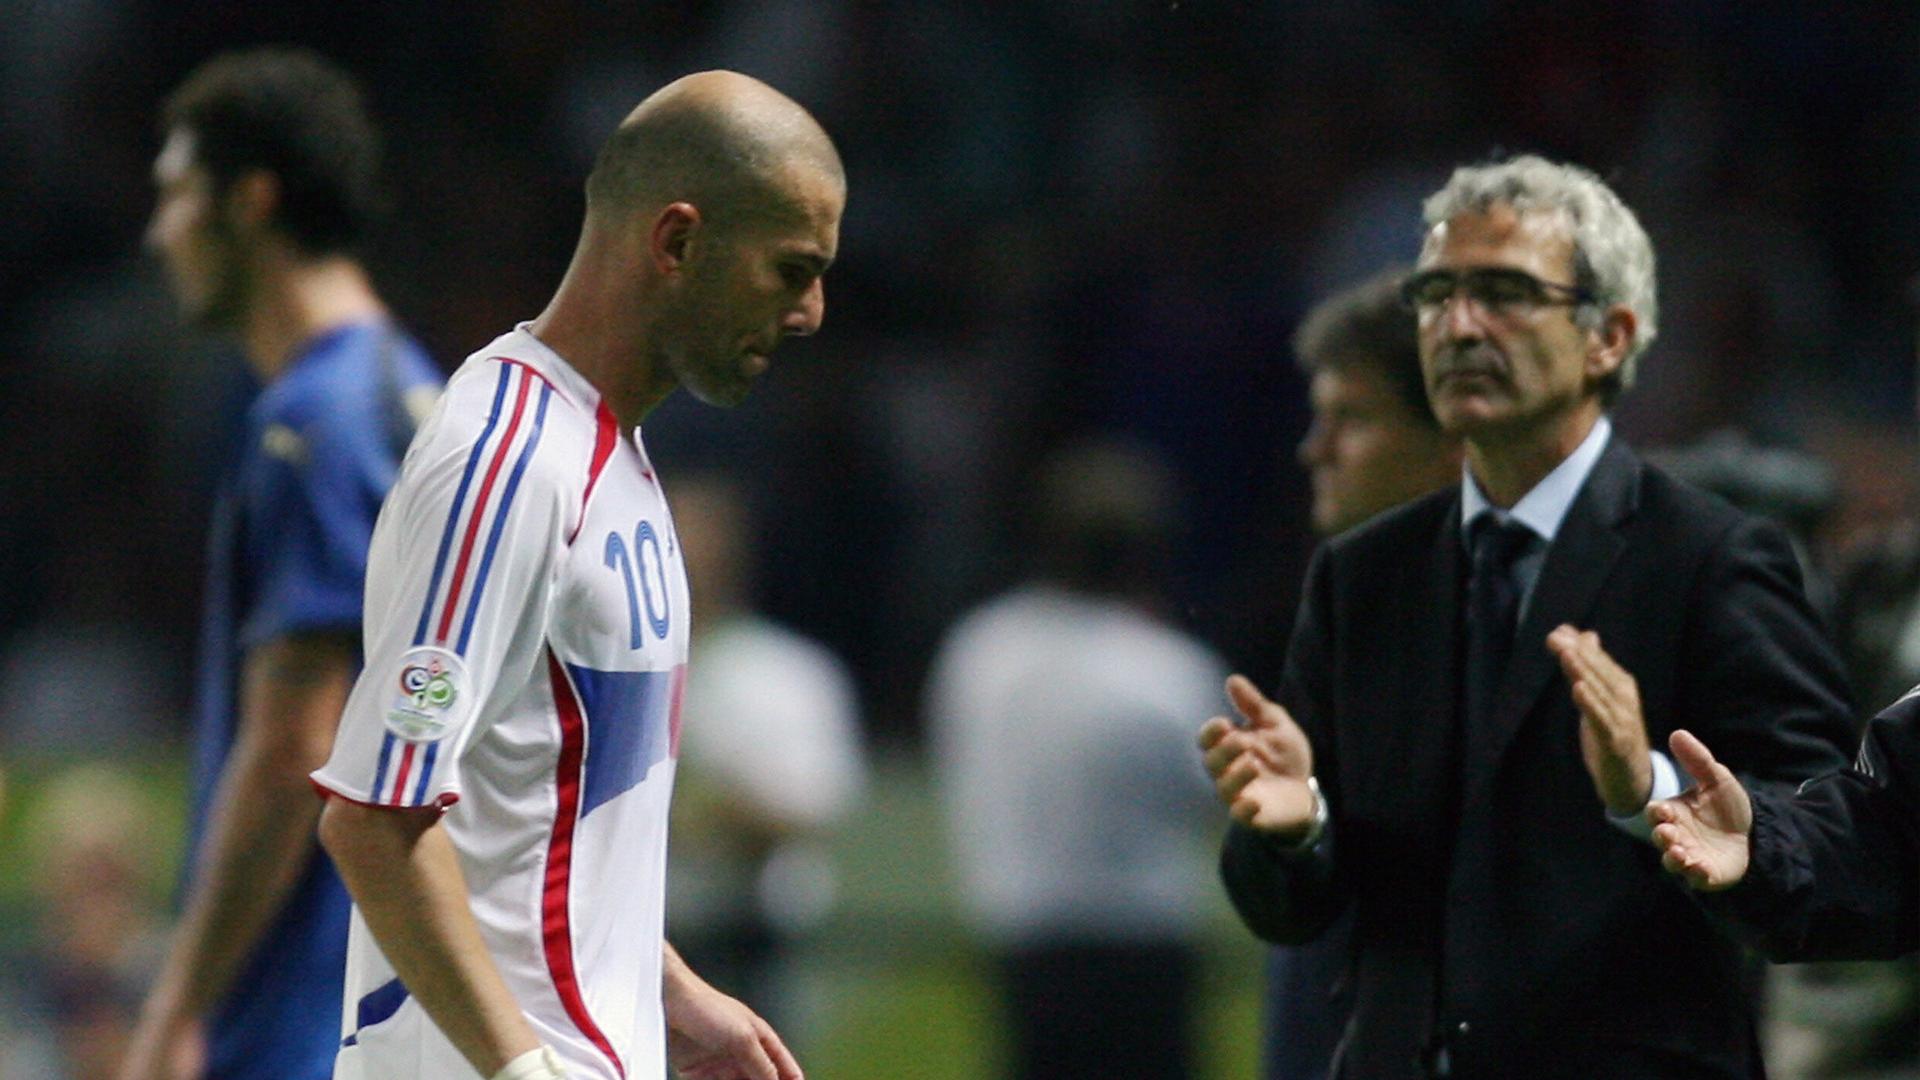 Zinedine Zidane and Raymond Domenech in the World Cup final in 2004